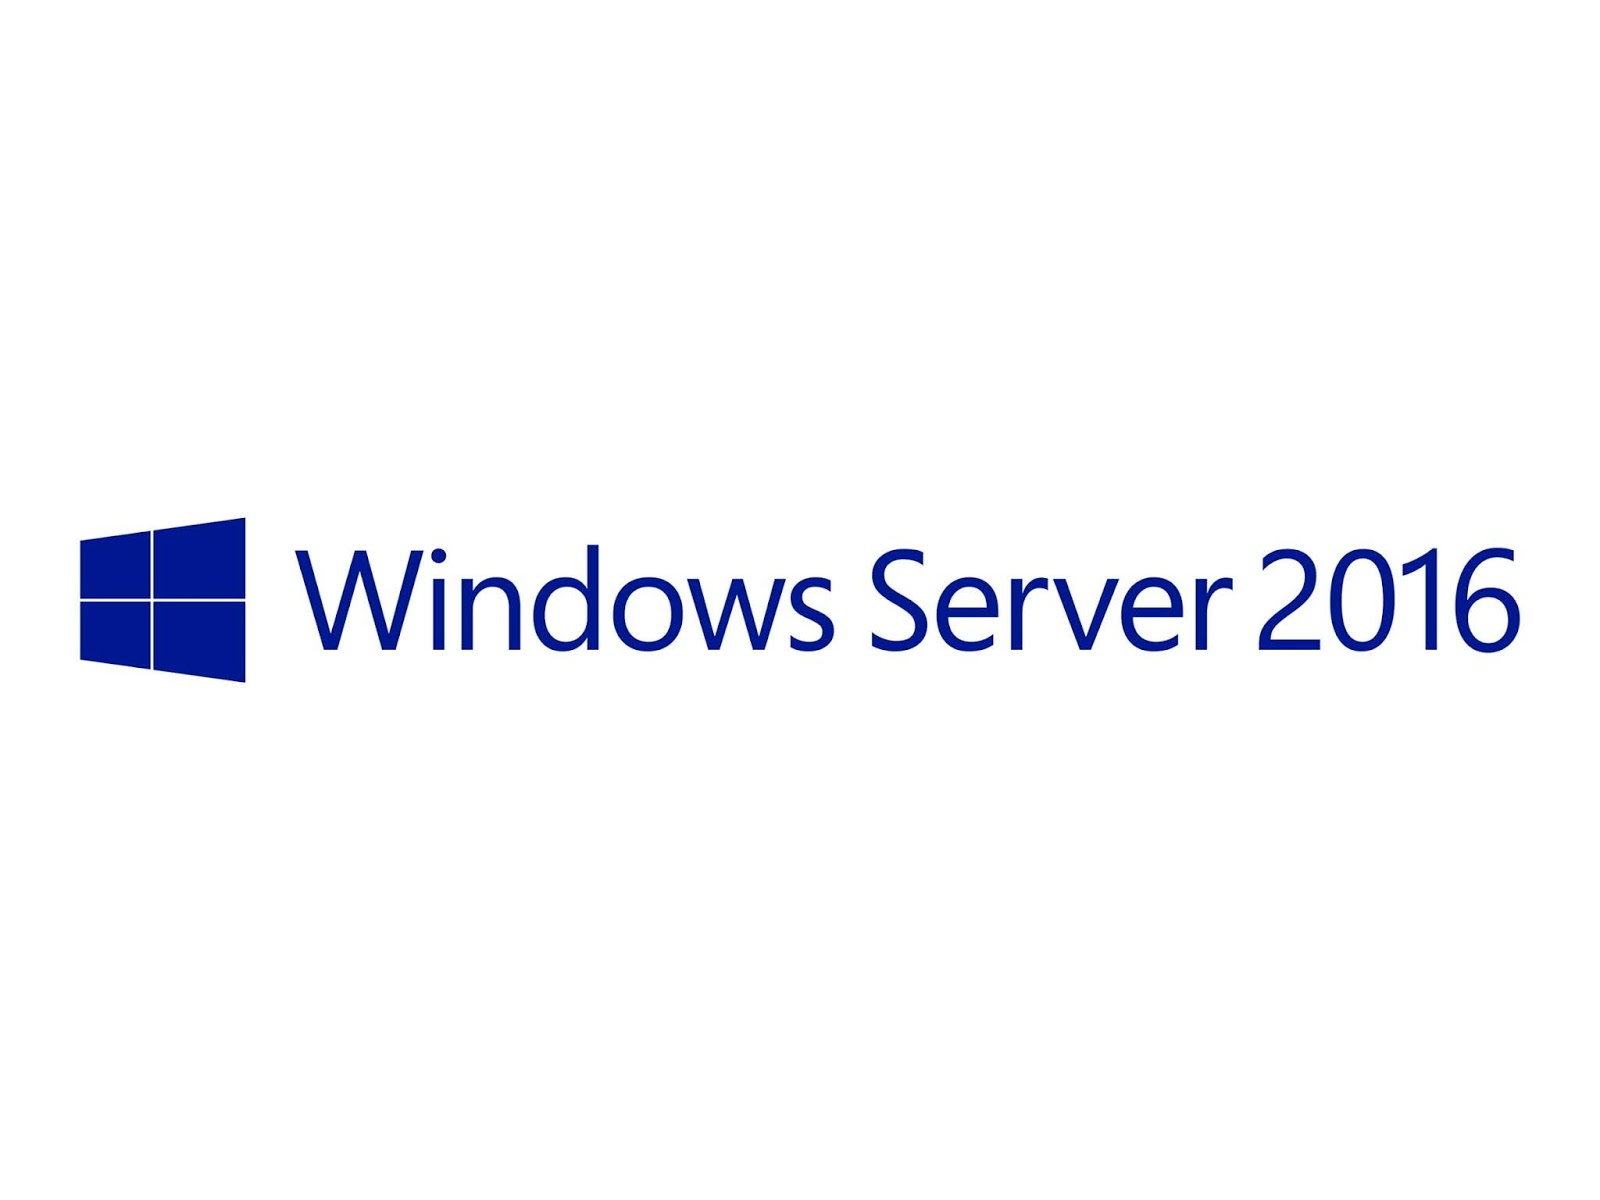 Windows Server 2016 Tutorial Full Steps By Vikas Singh | New